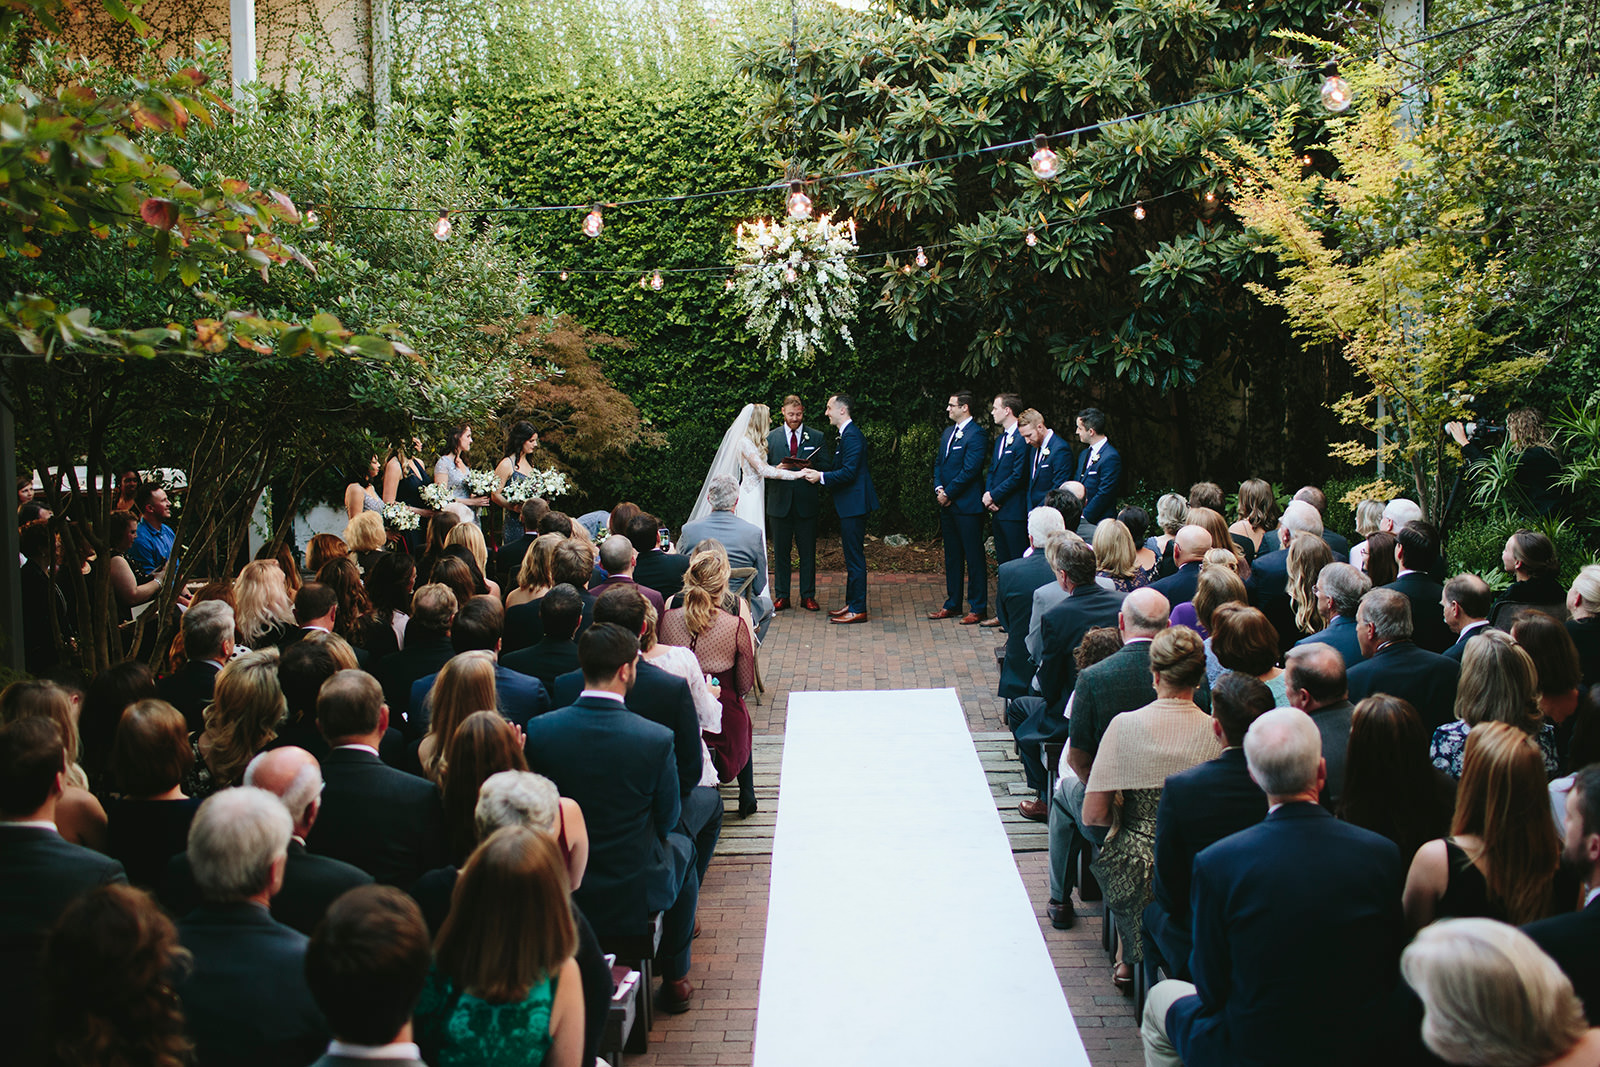 weddings at the atrium photos